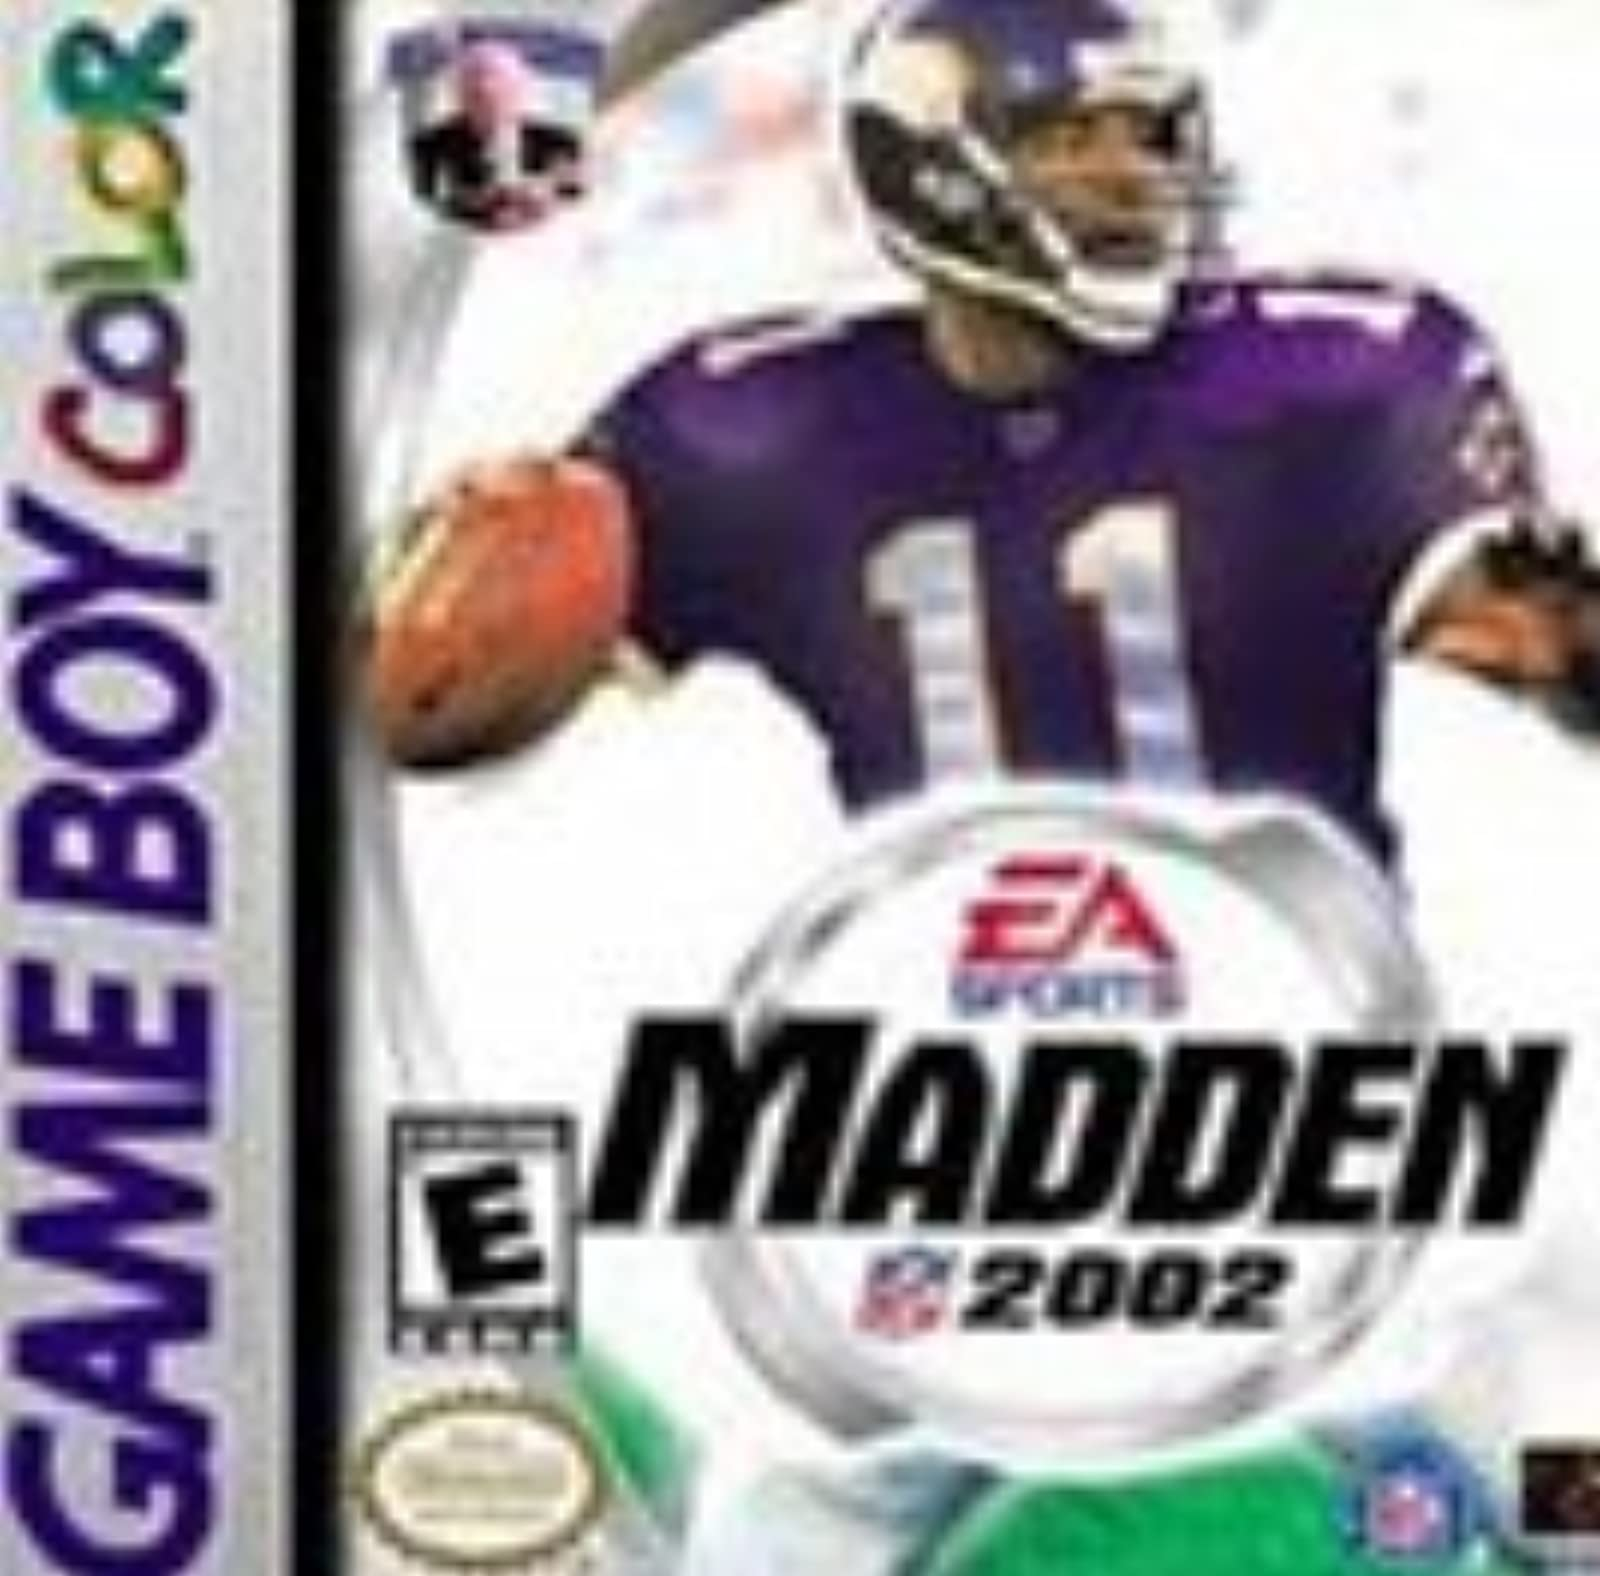 Madden NFL 2002 On Gameboy Color Football